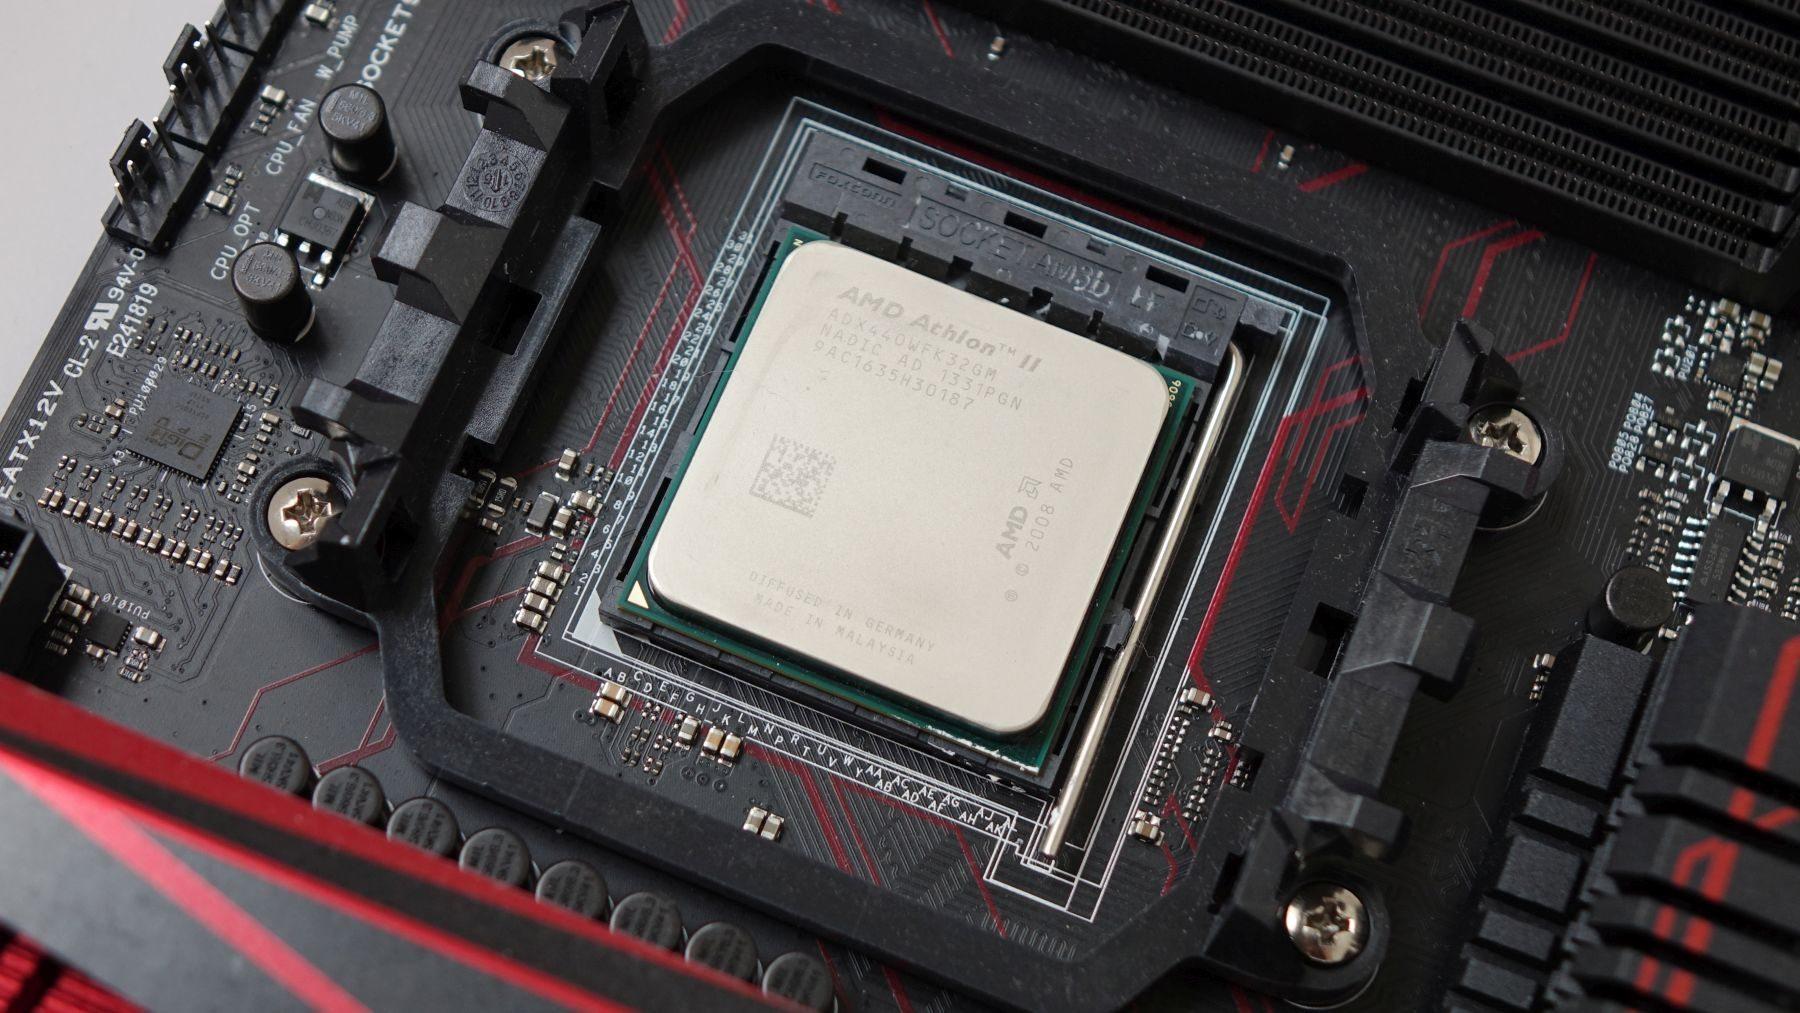 AMD ATHLON X3 440 DRIVERS WINDOWS XP